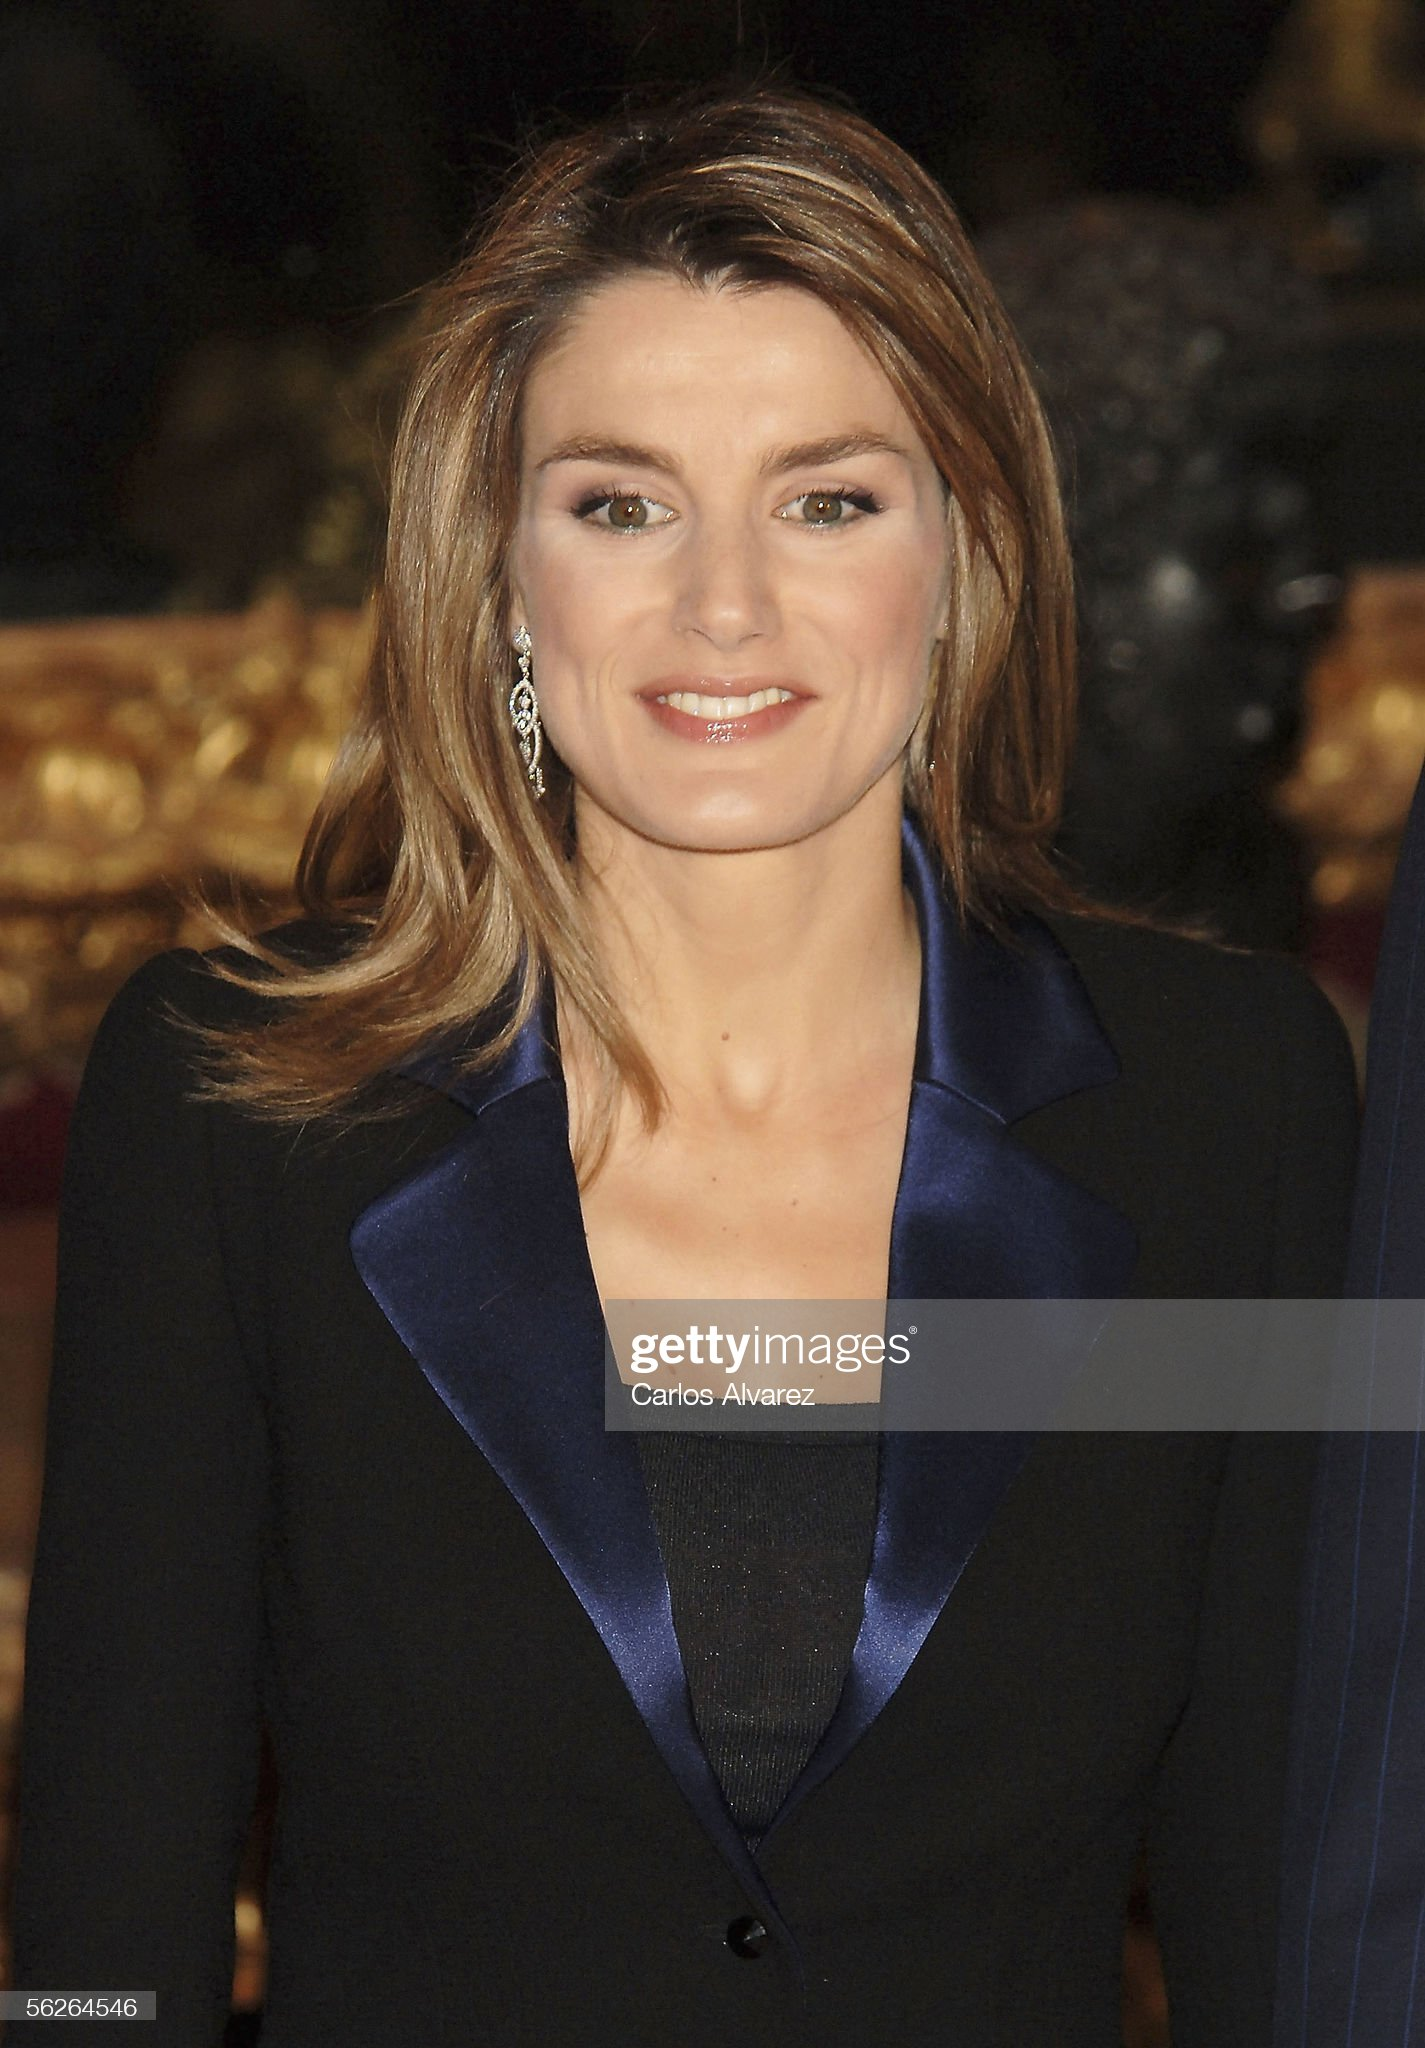 Вечерние наряды Королевы Летиции Spanish Royal Family Celebrate 30 years Of King Juan Carlos's Kingdom : News Photo